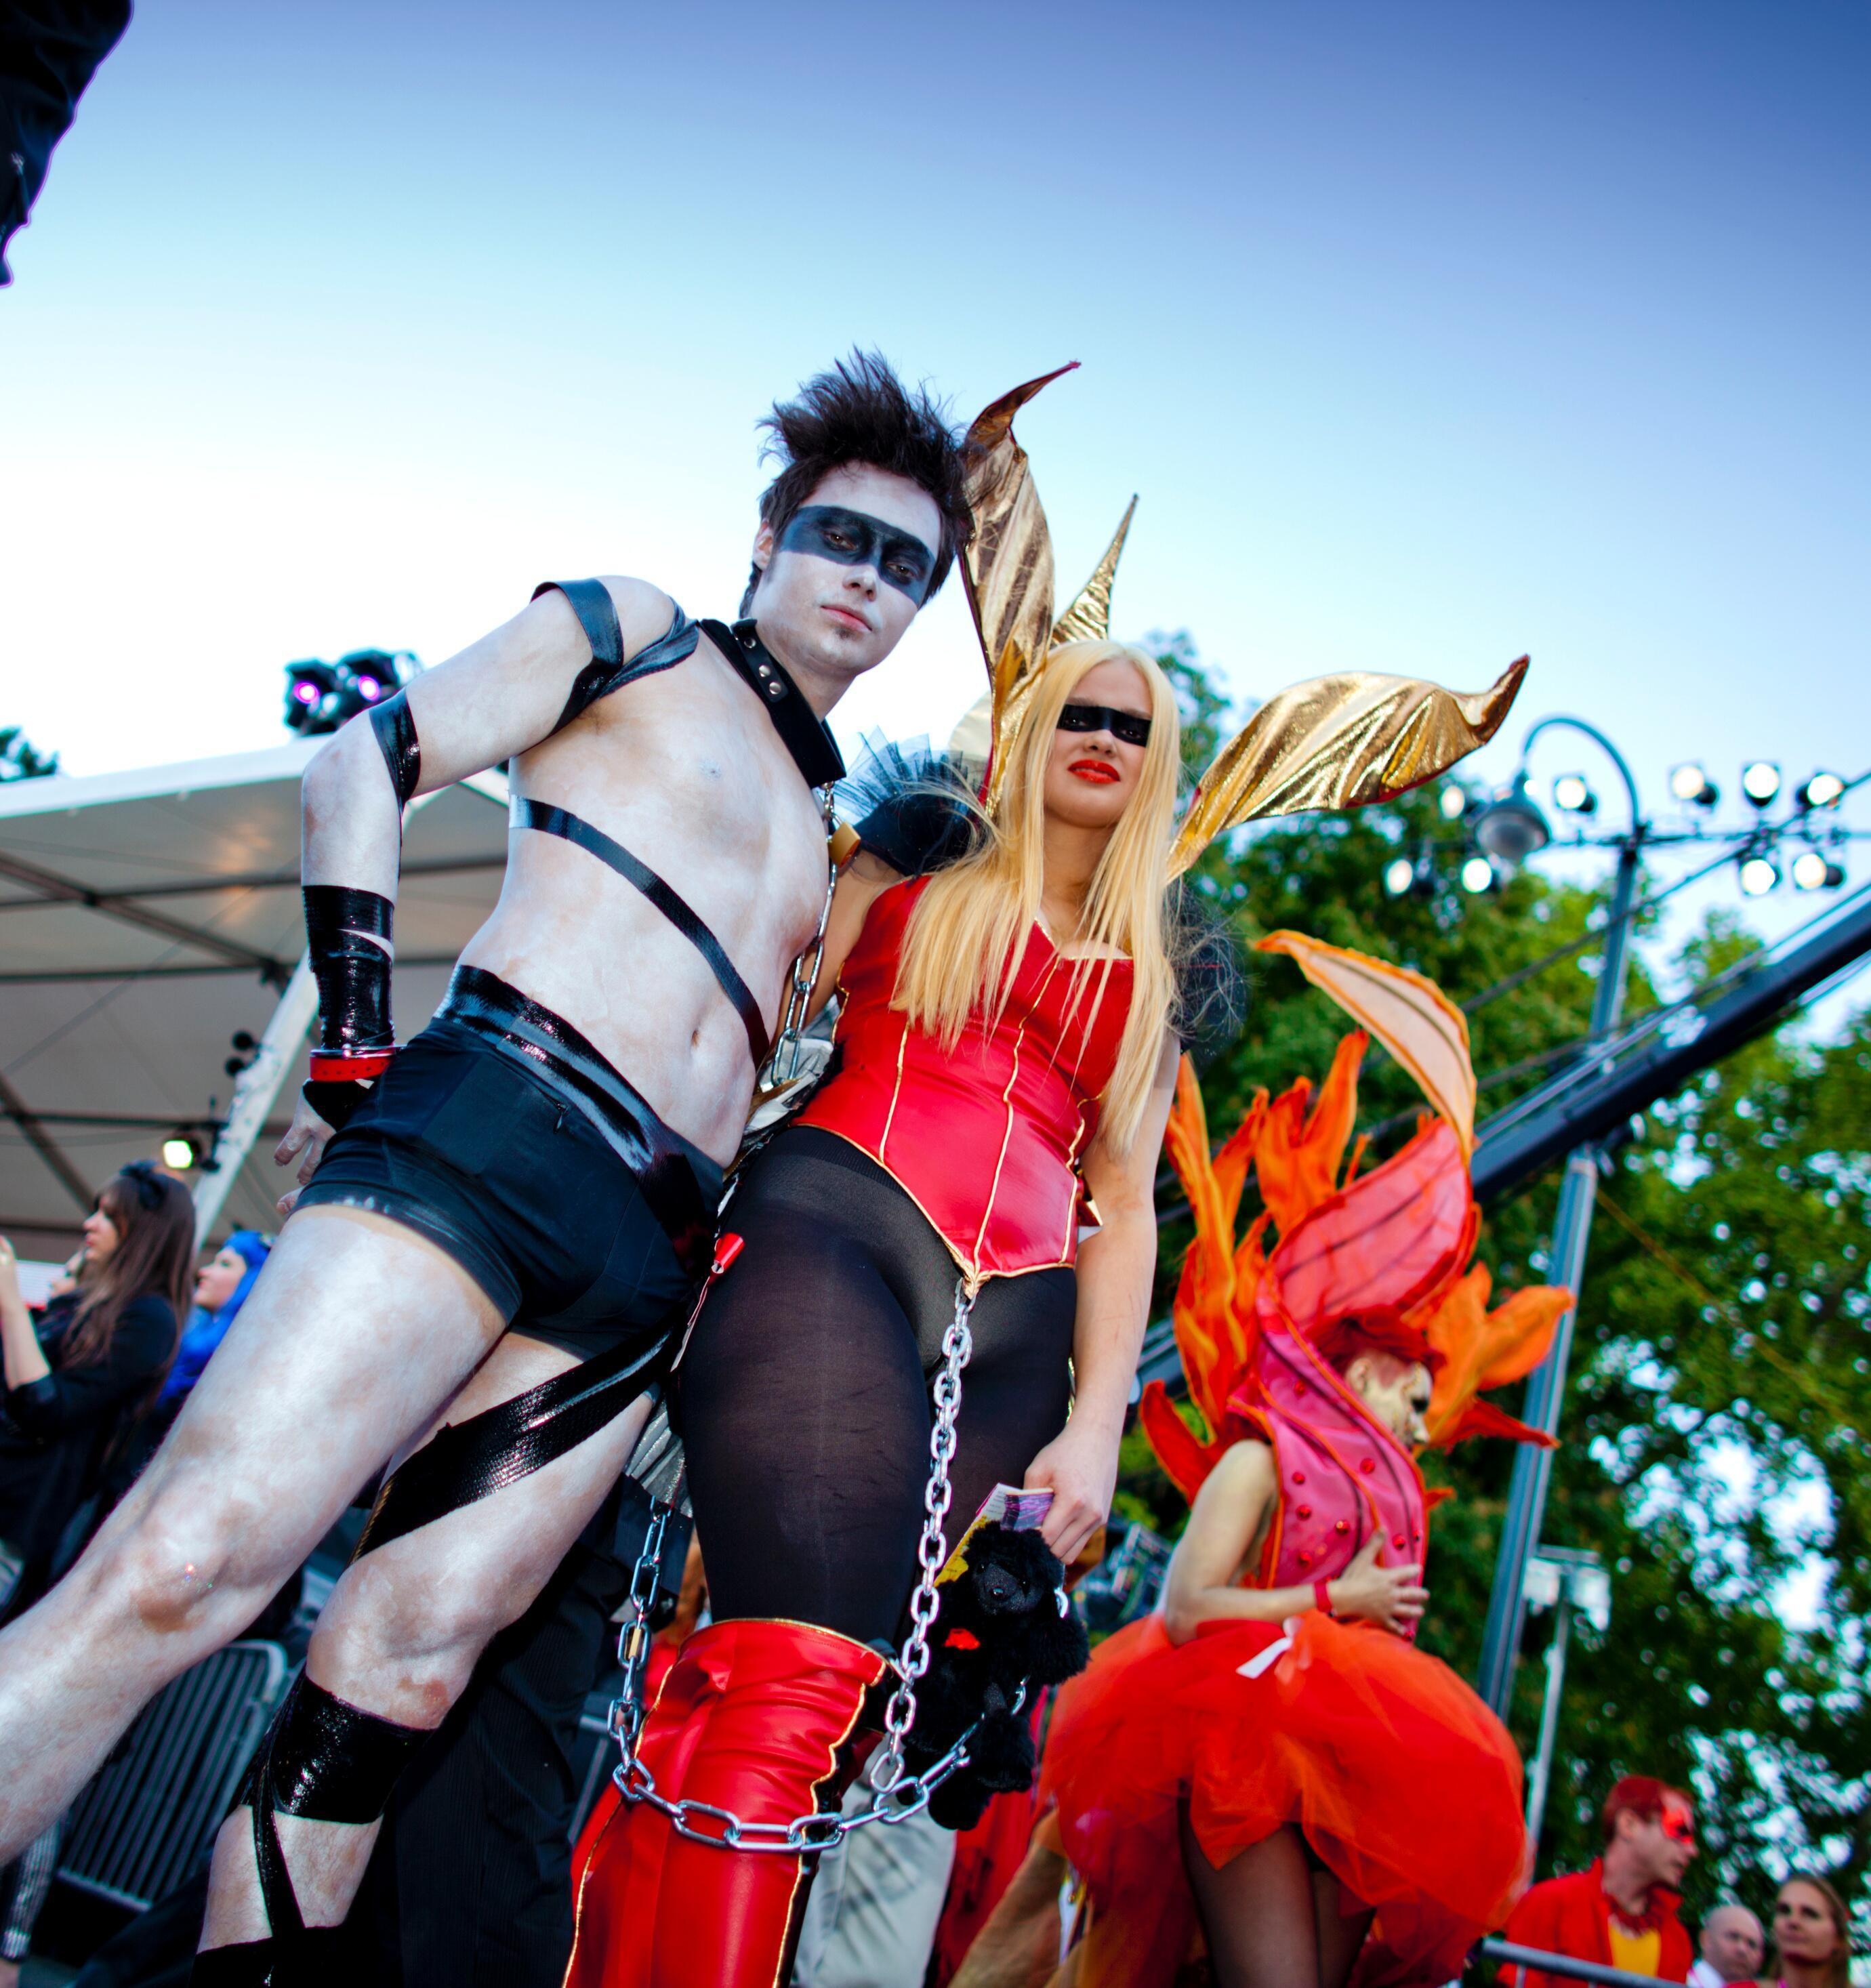 Bild zu Life Ball 2012, Gäste